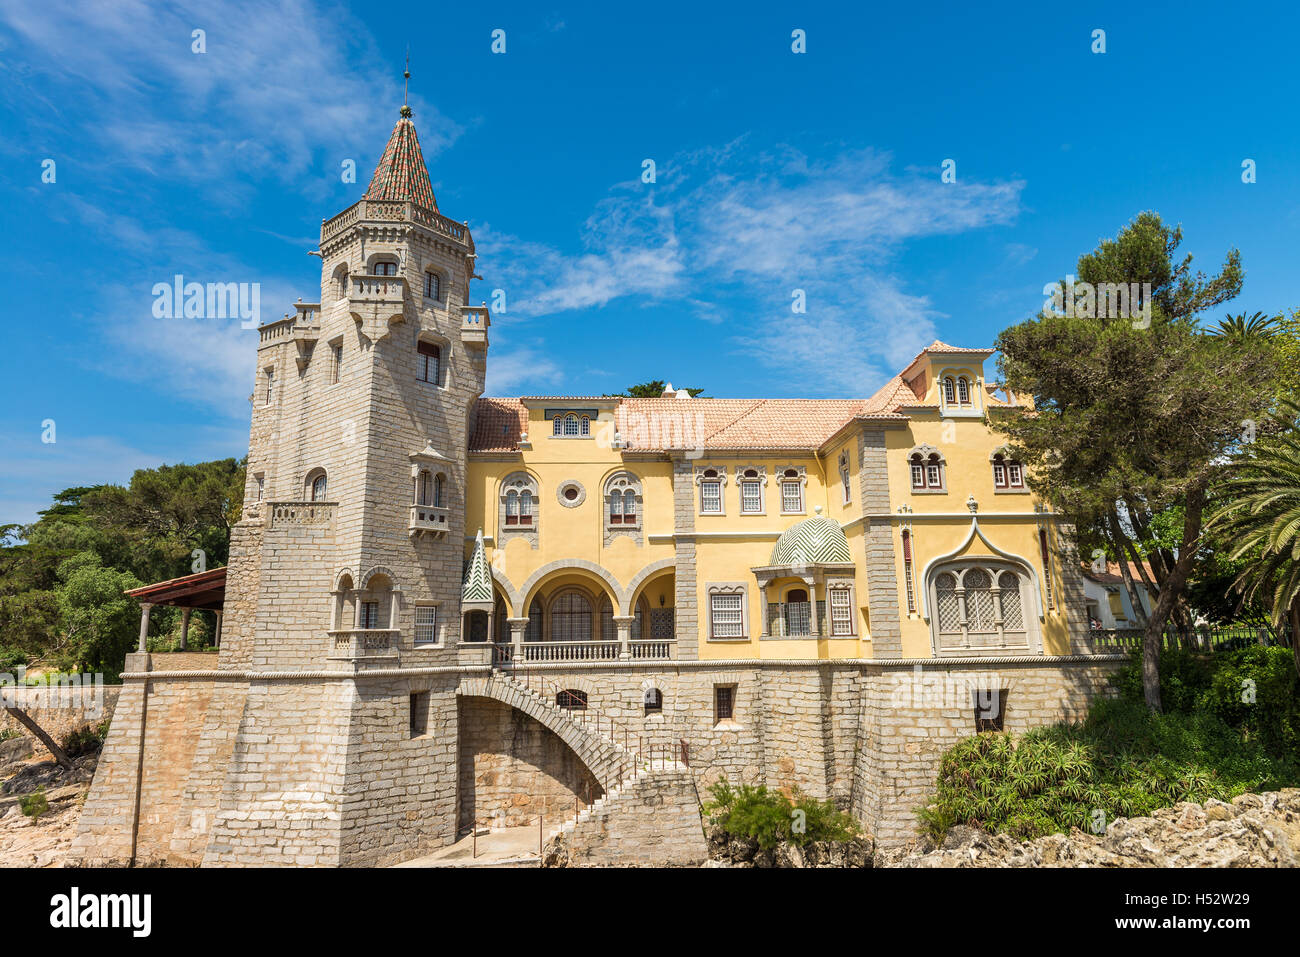 Cascais, Portugal - April 22, 2014: Beautiful building of the Museu Condes de Castro Guimaraes in Cascais, Portugal Stock Photo